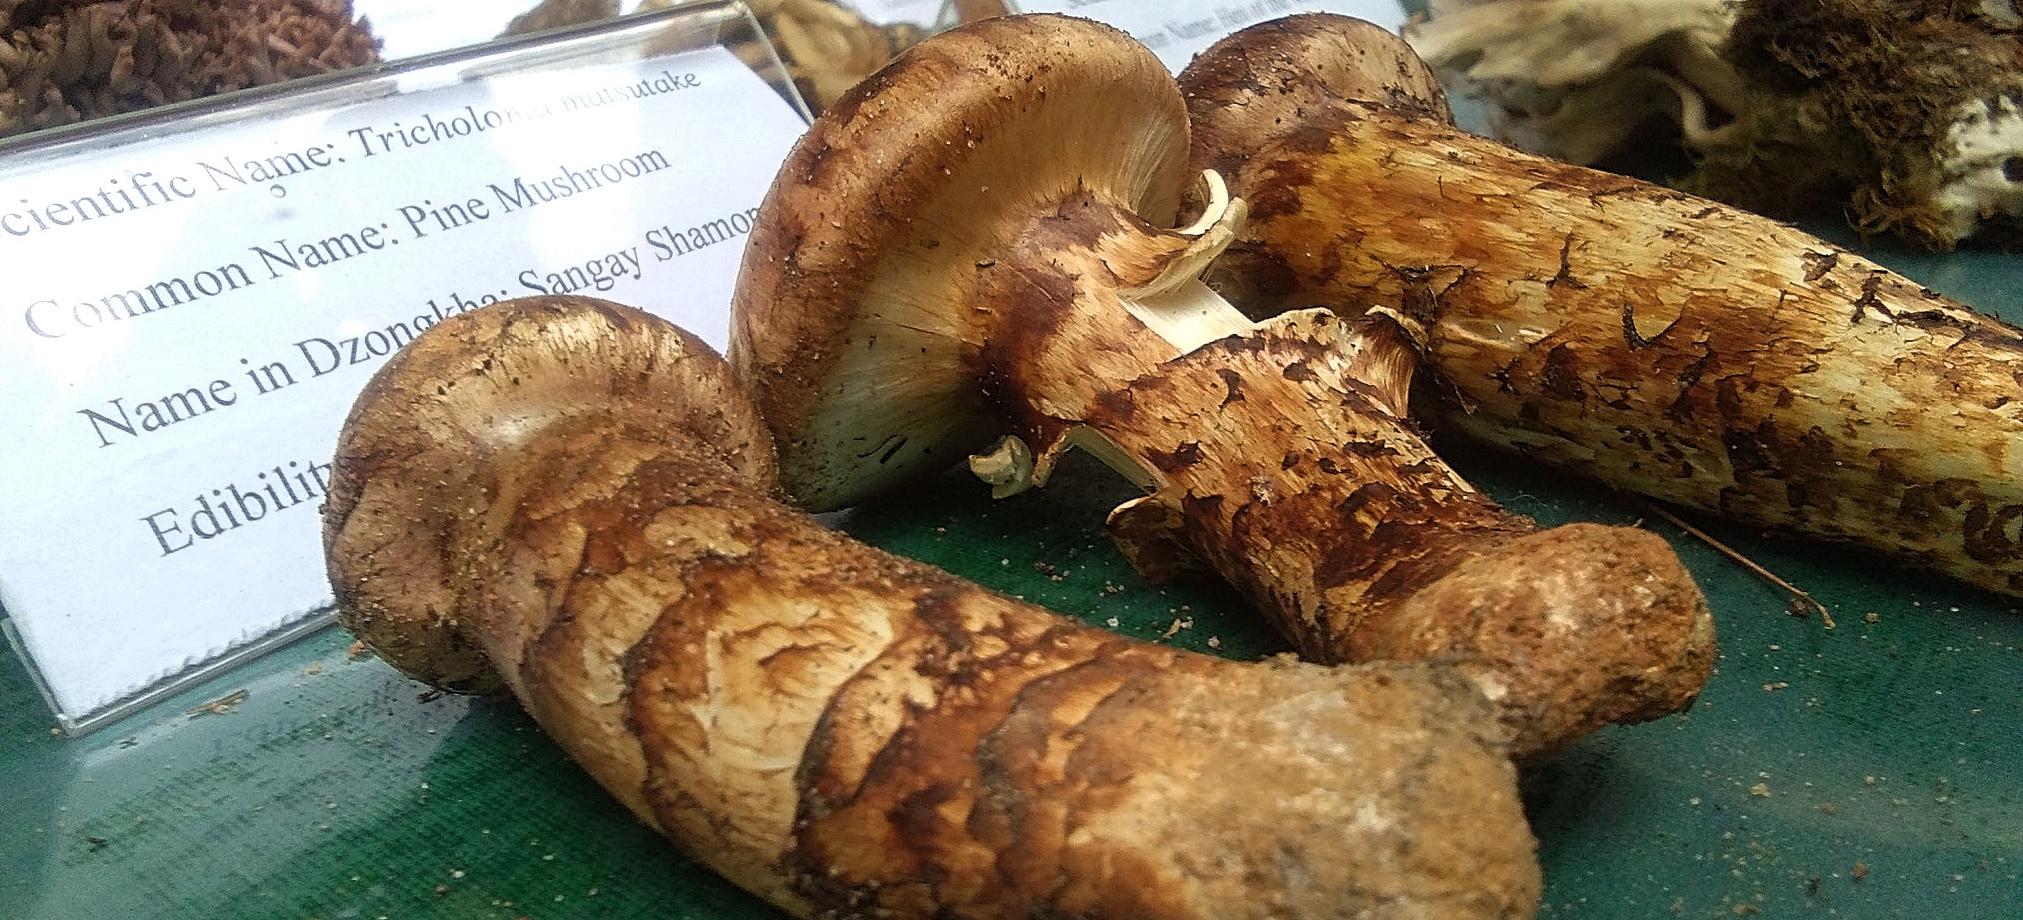 Genekha Mushroom Festival